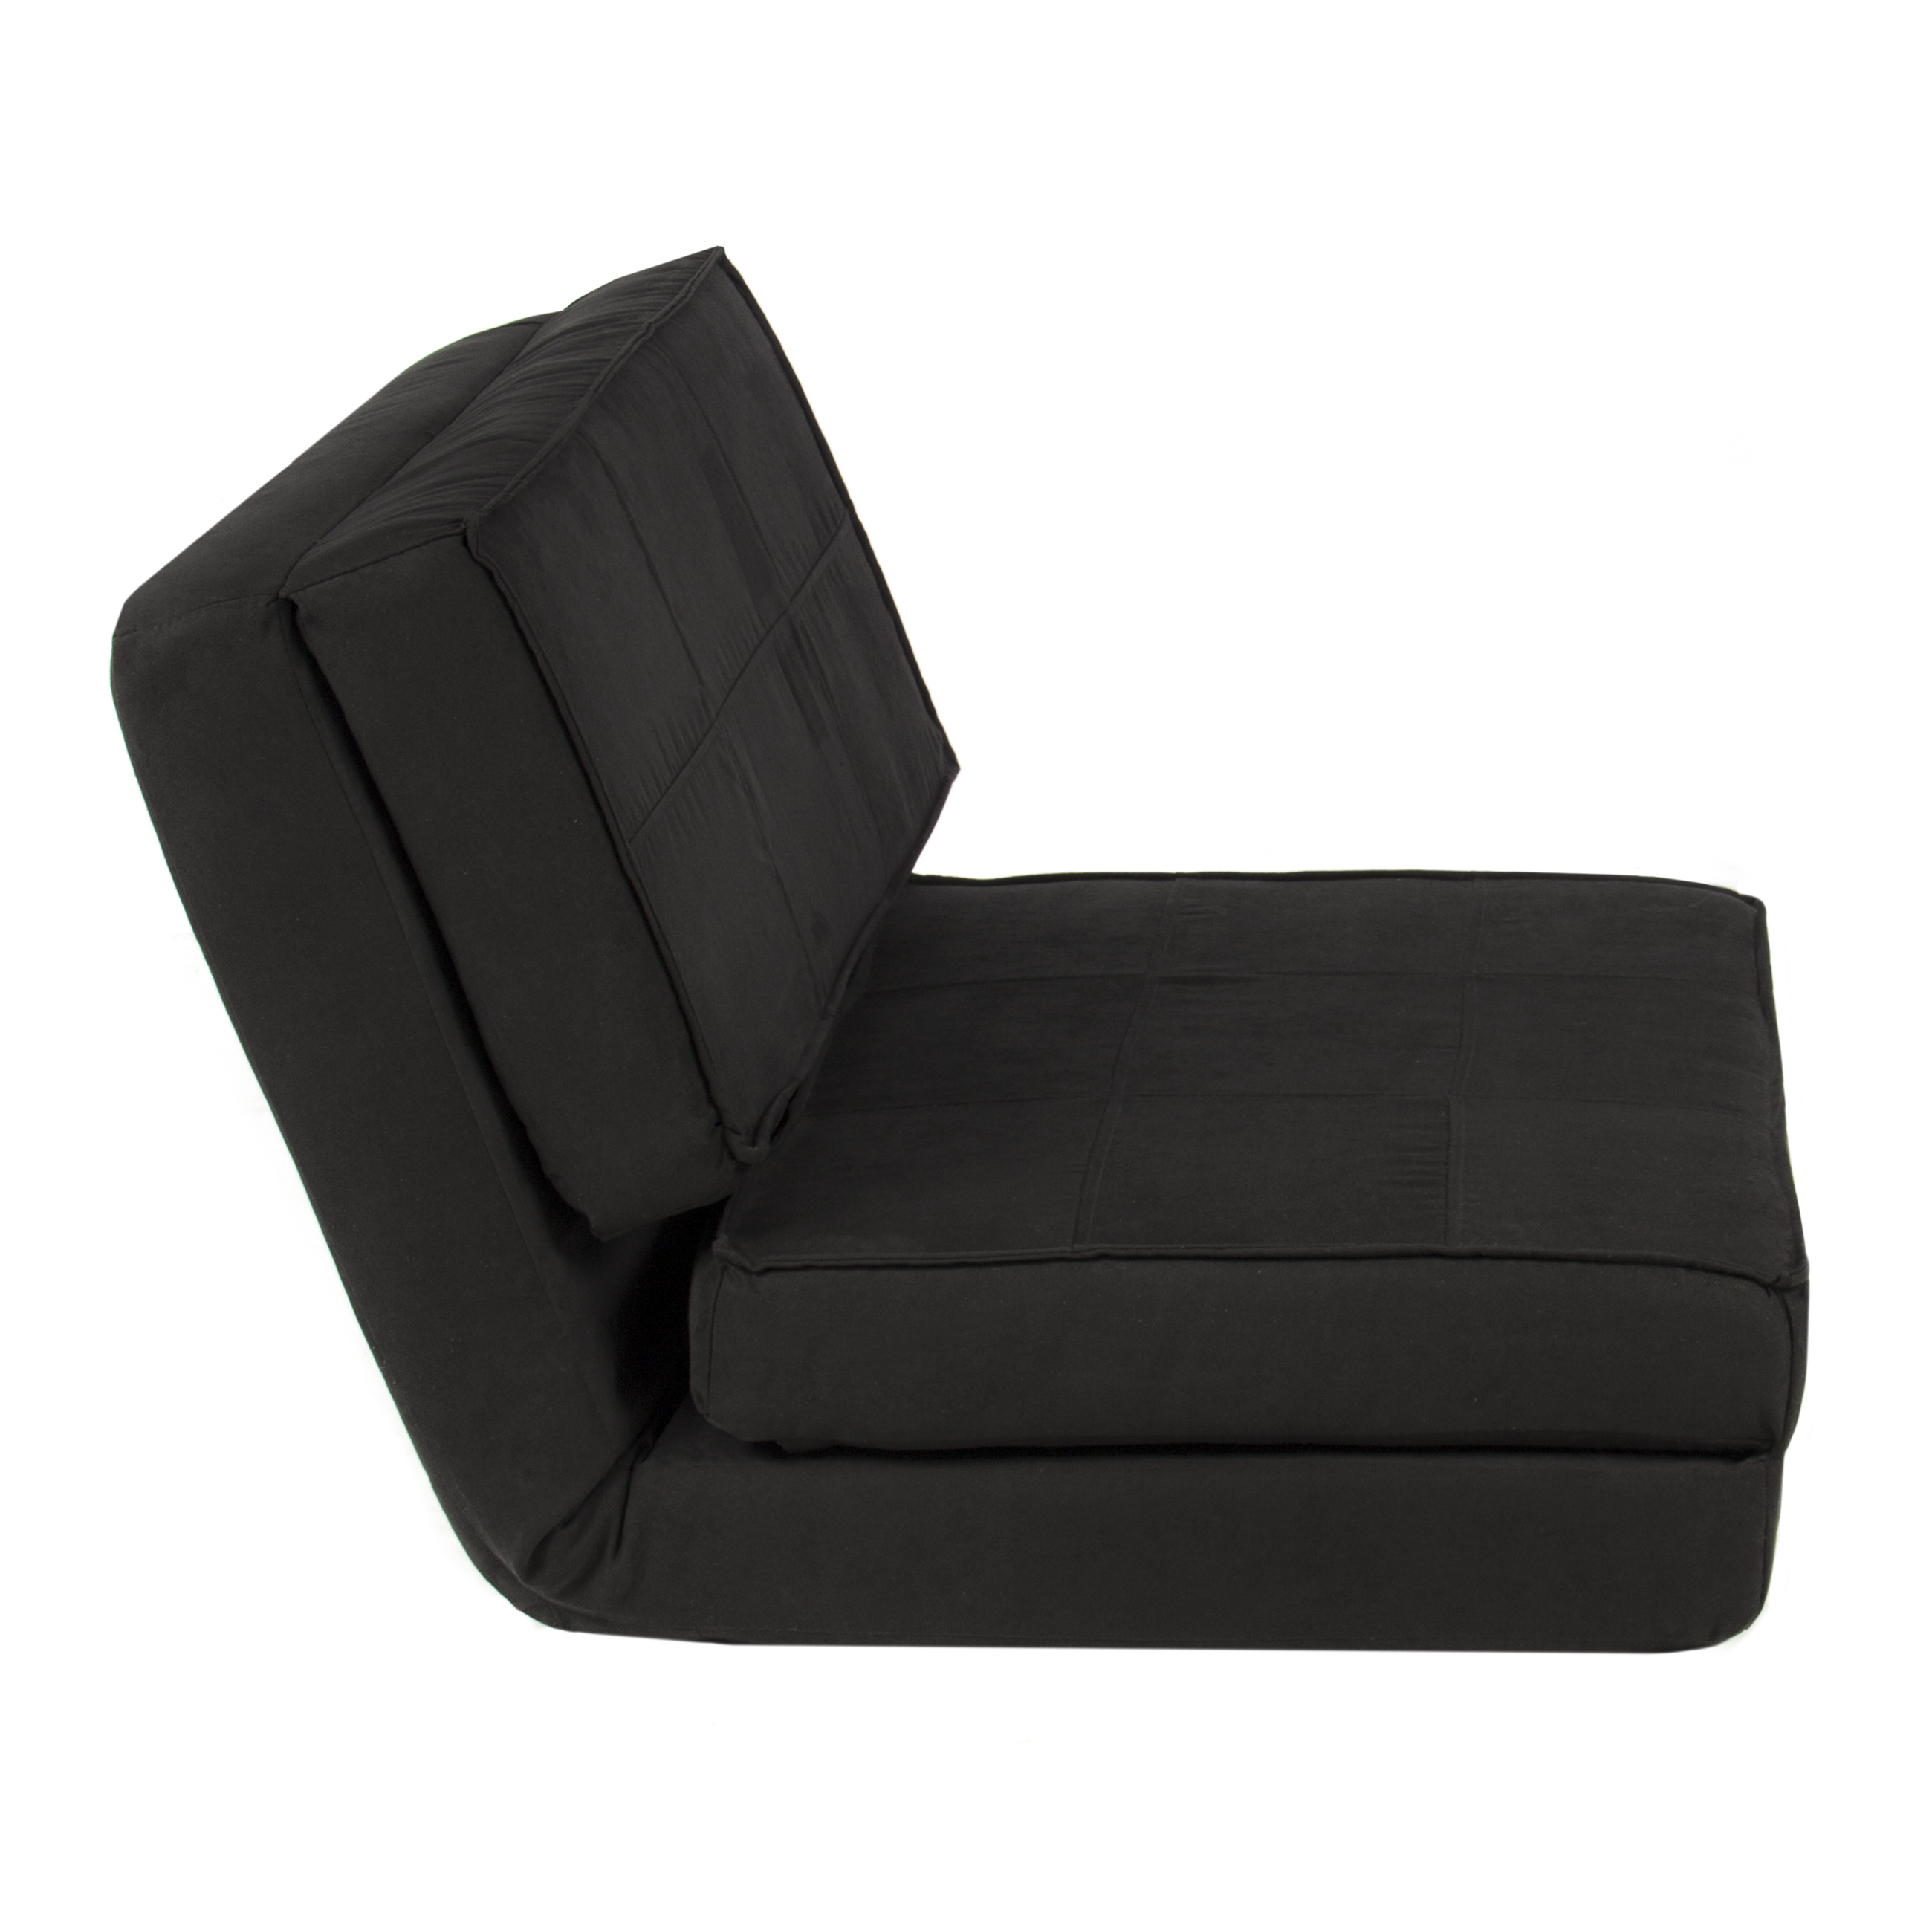 Folding Sofa Chair Sofas Sleeper Love Seat Sofa Sets